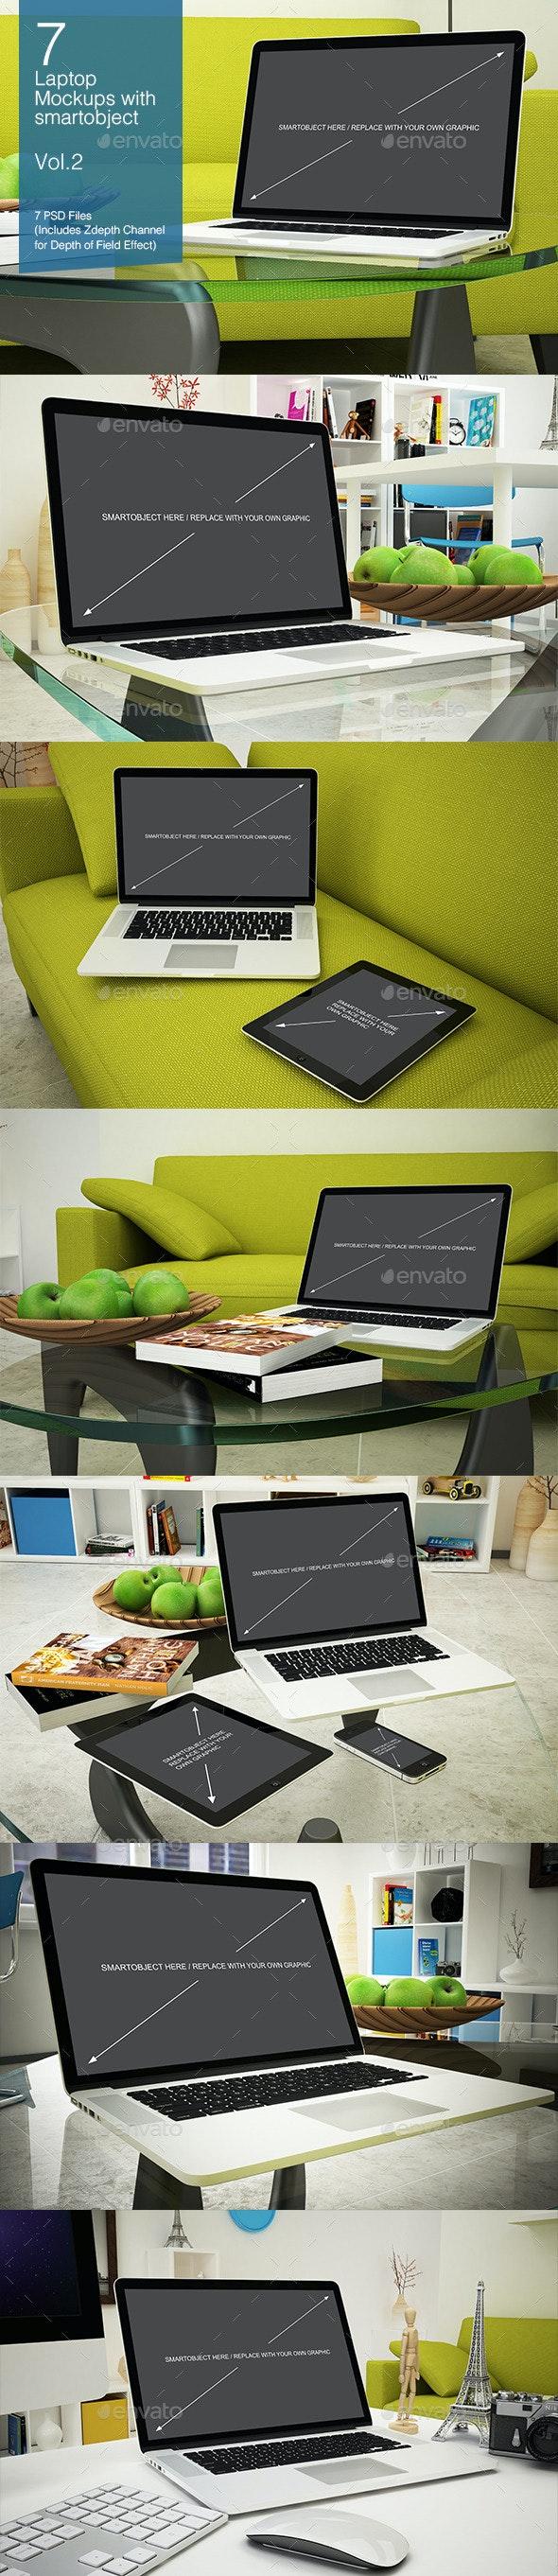 Laptop Mockup 7 Poses - Vol.2 - Laptop Displays